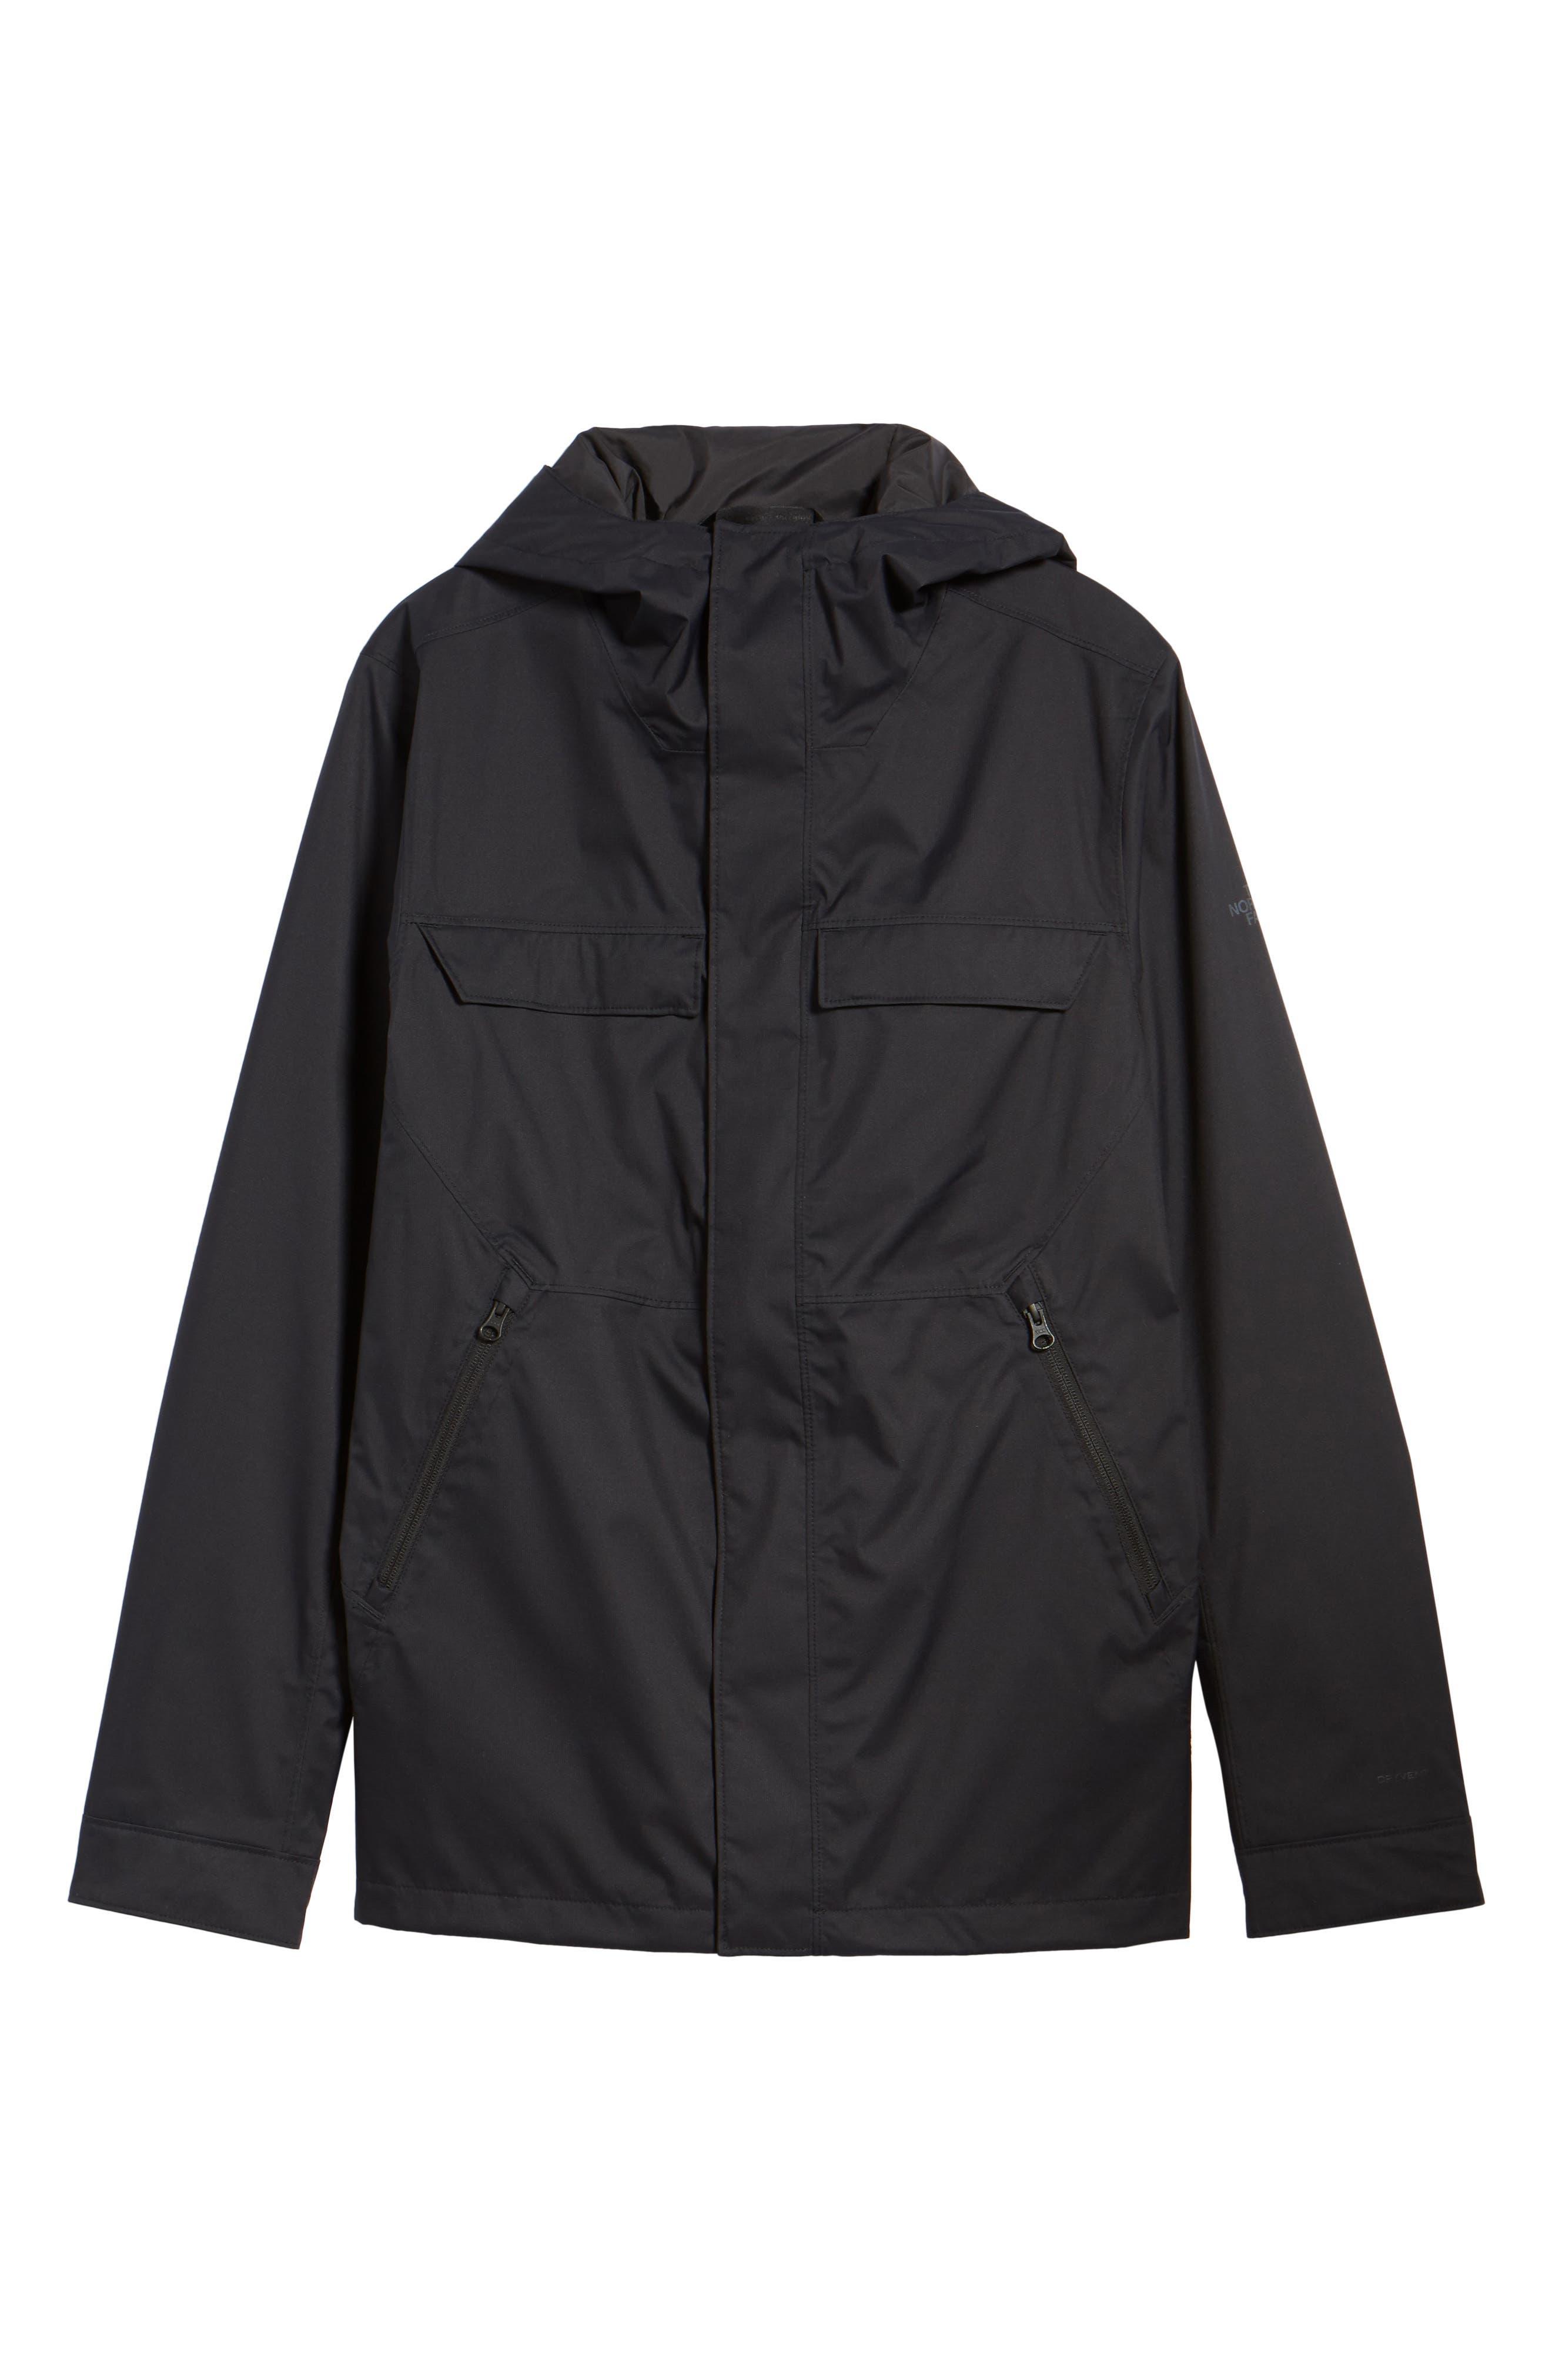 Jenison II Insulated Waterproof Jacket,                             Alternate thumbnail 6, color,                             Tnf Black